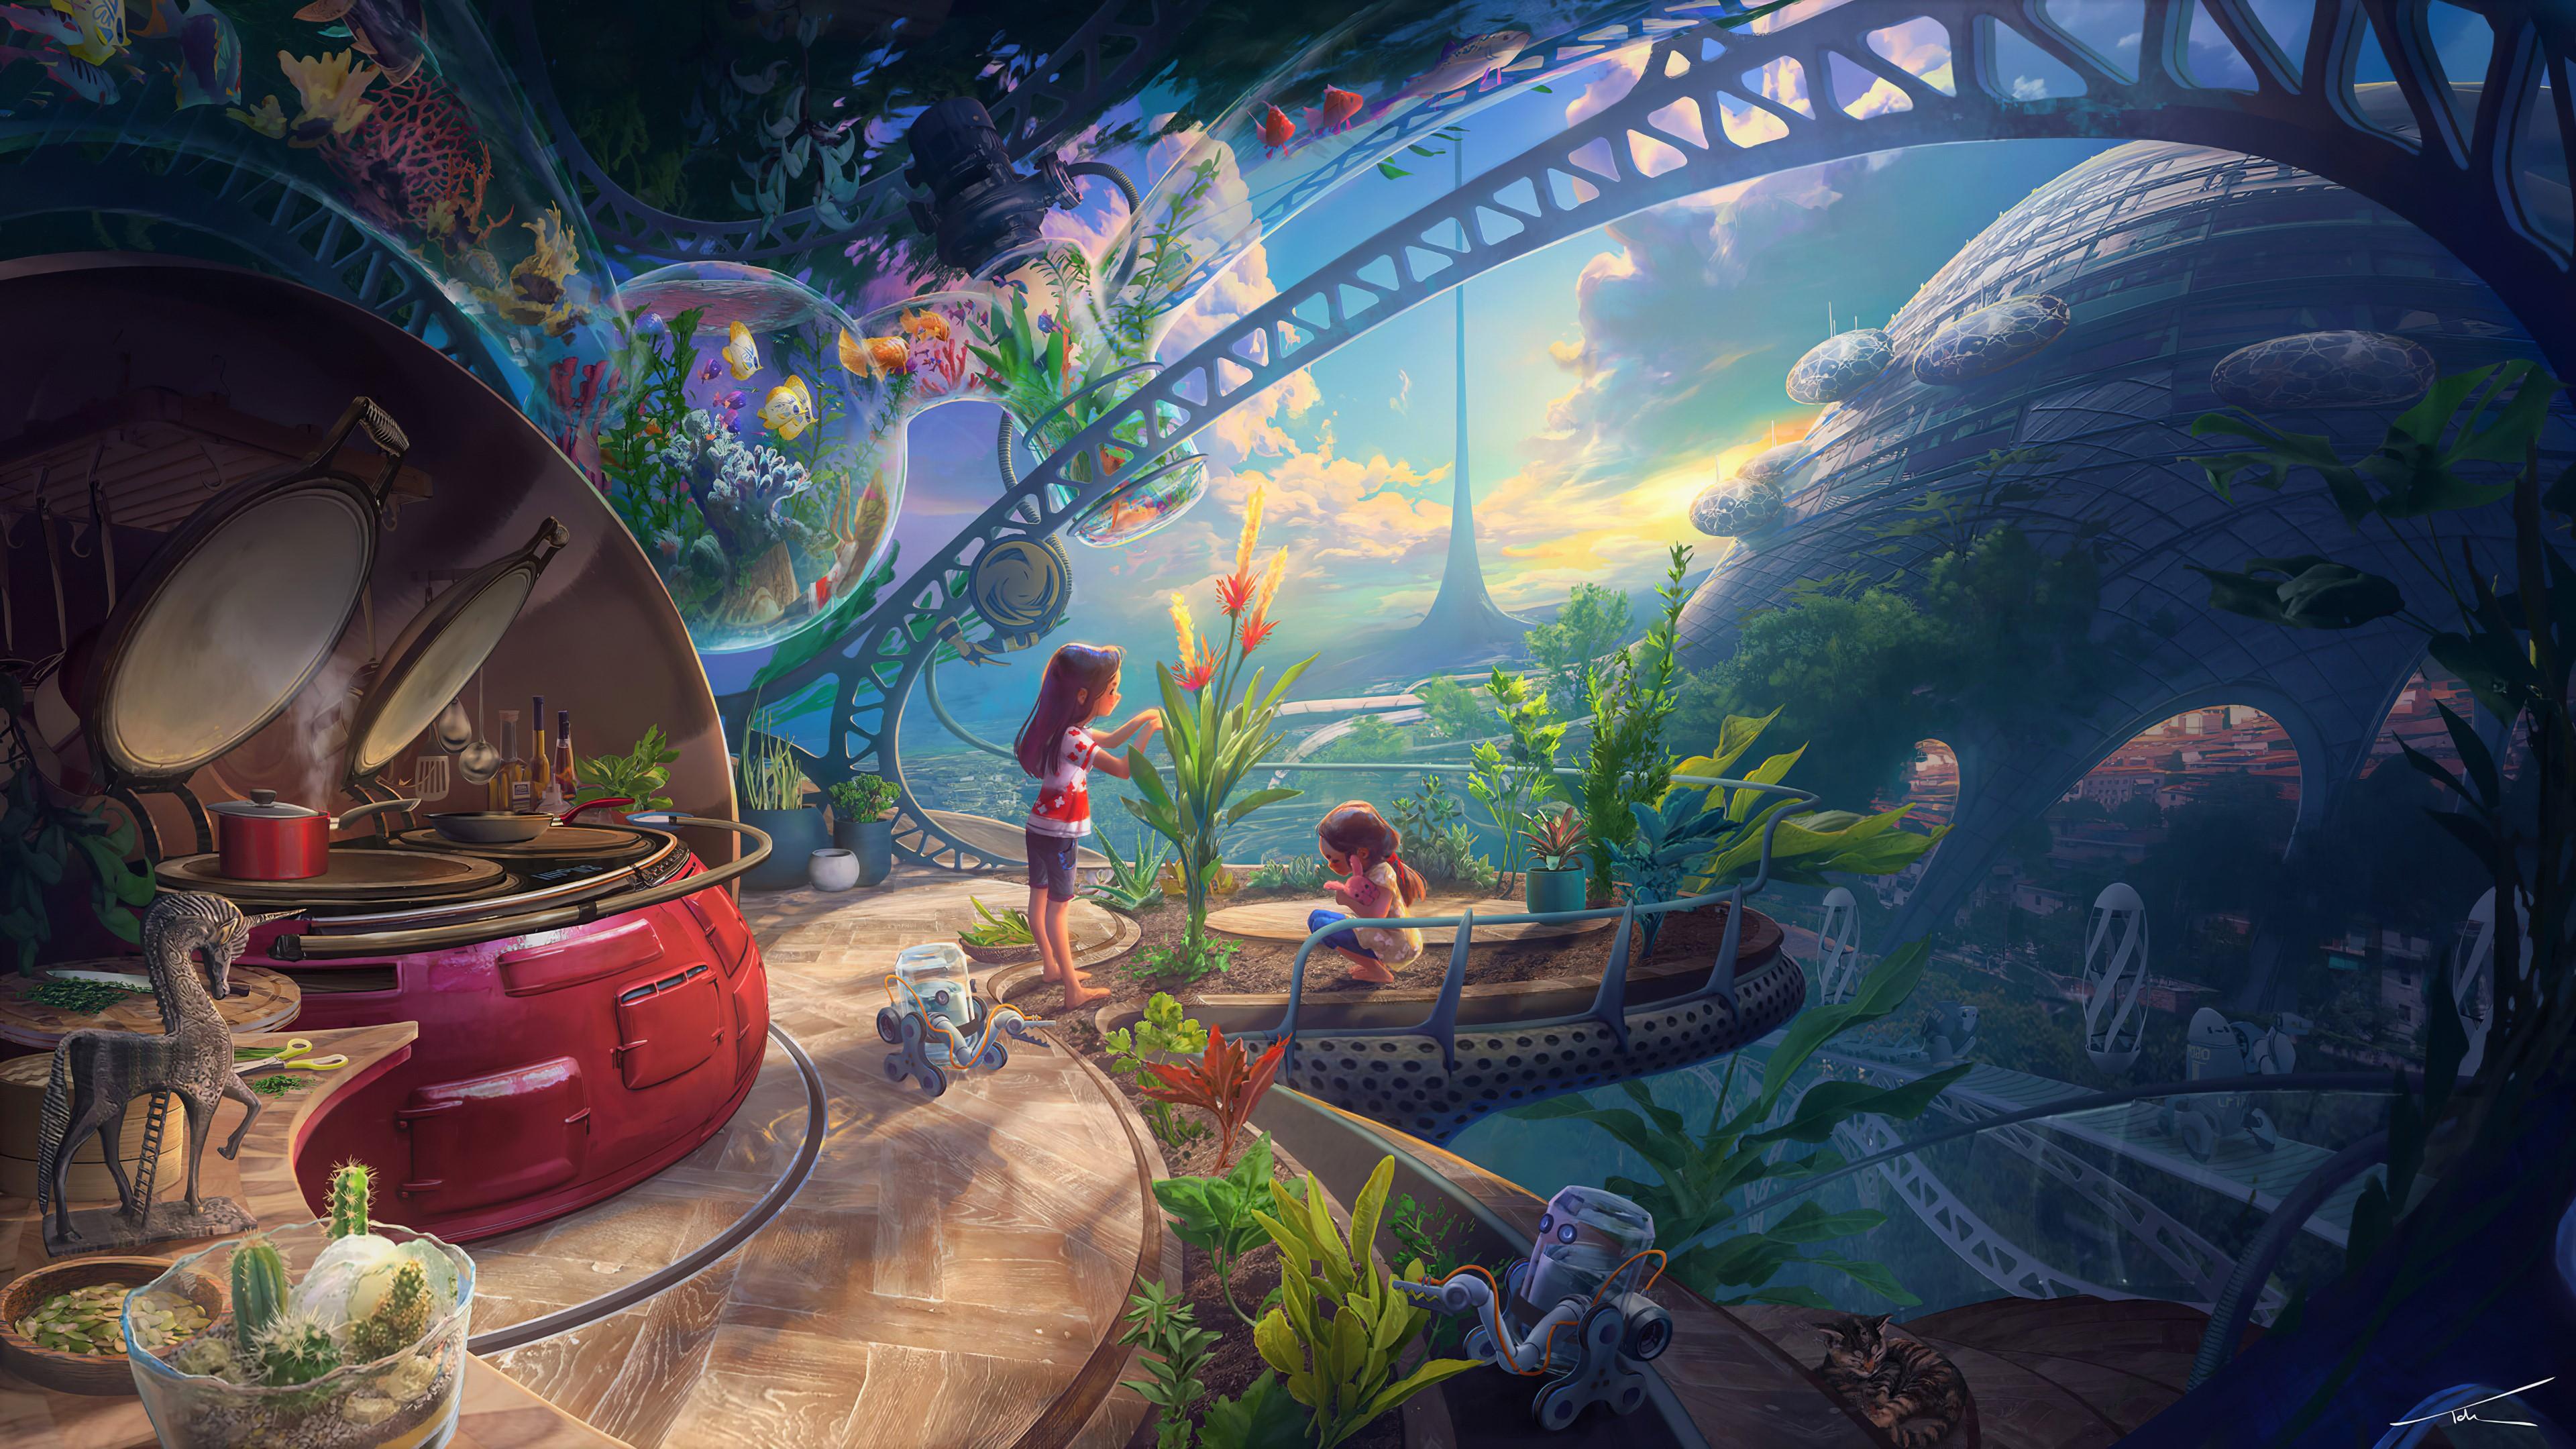 General 3840x2160 Thomas Chamberlain - Keen colorful fantasy art futuristic city